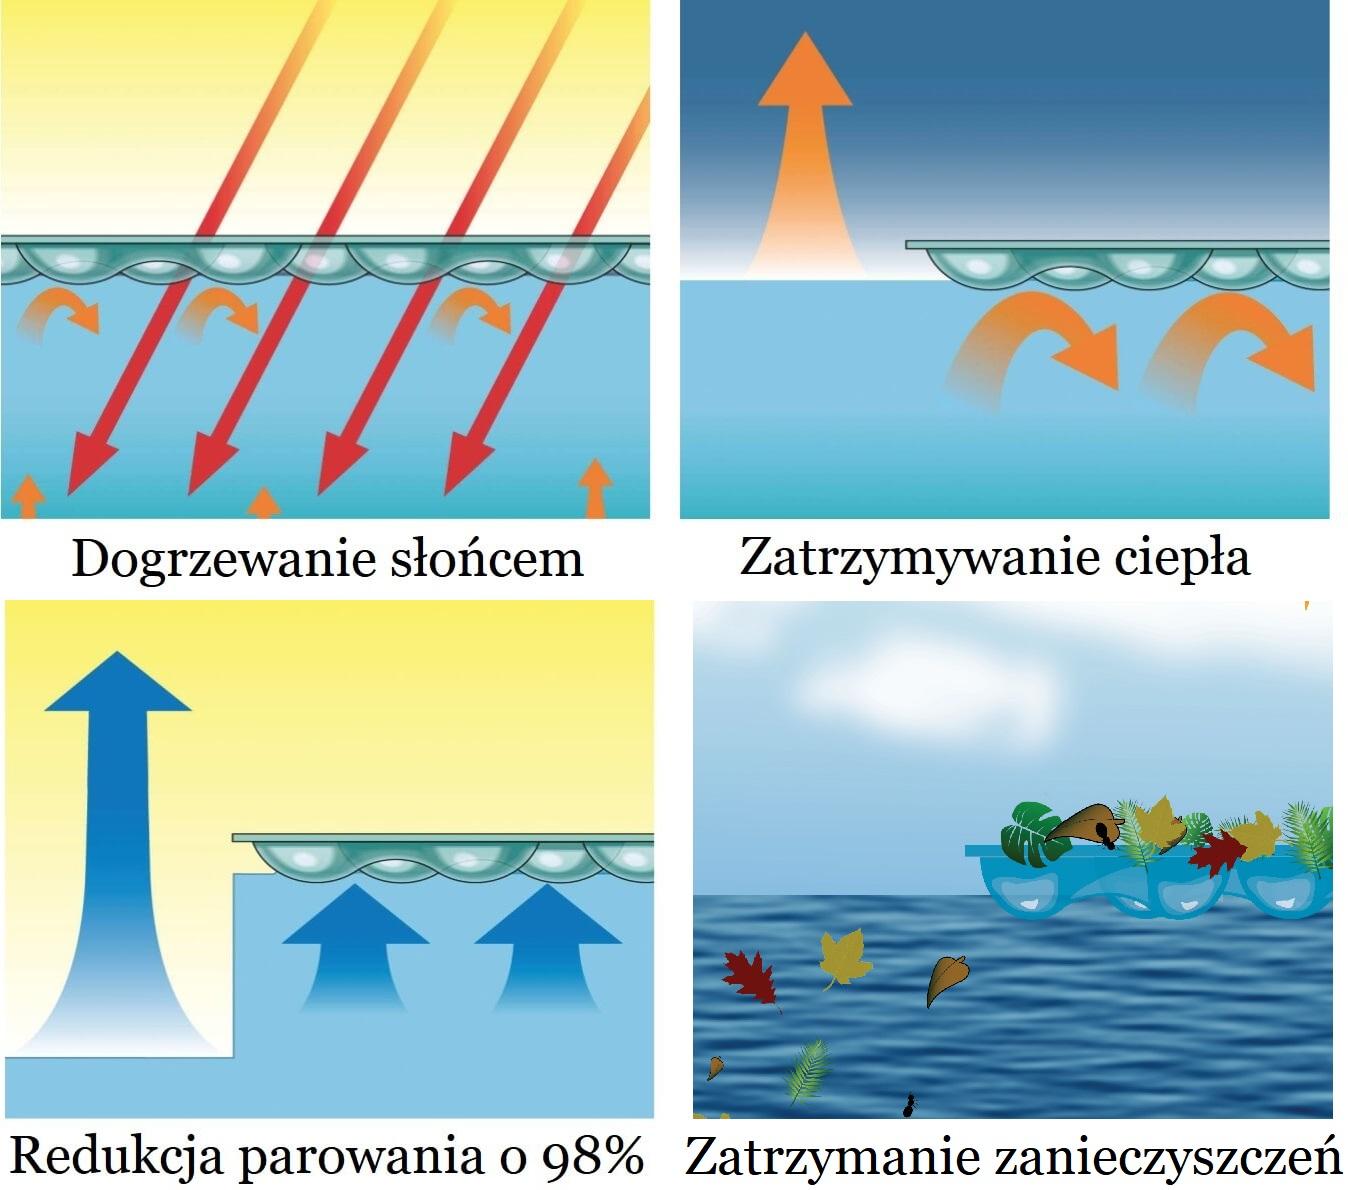 năng lượng mặt trời cho hồ bơi geobubble - lợi ích